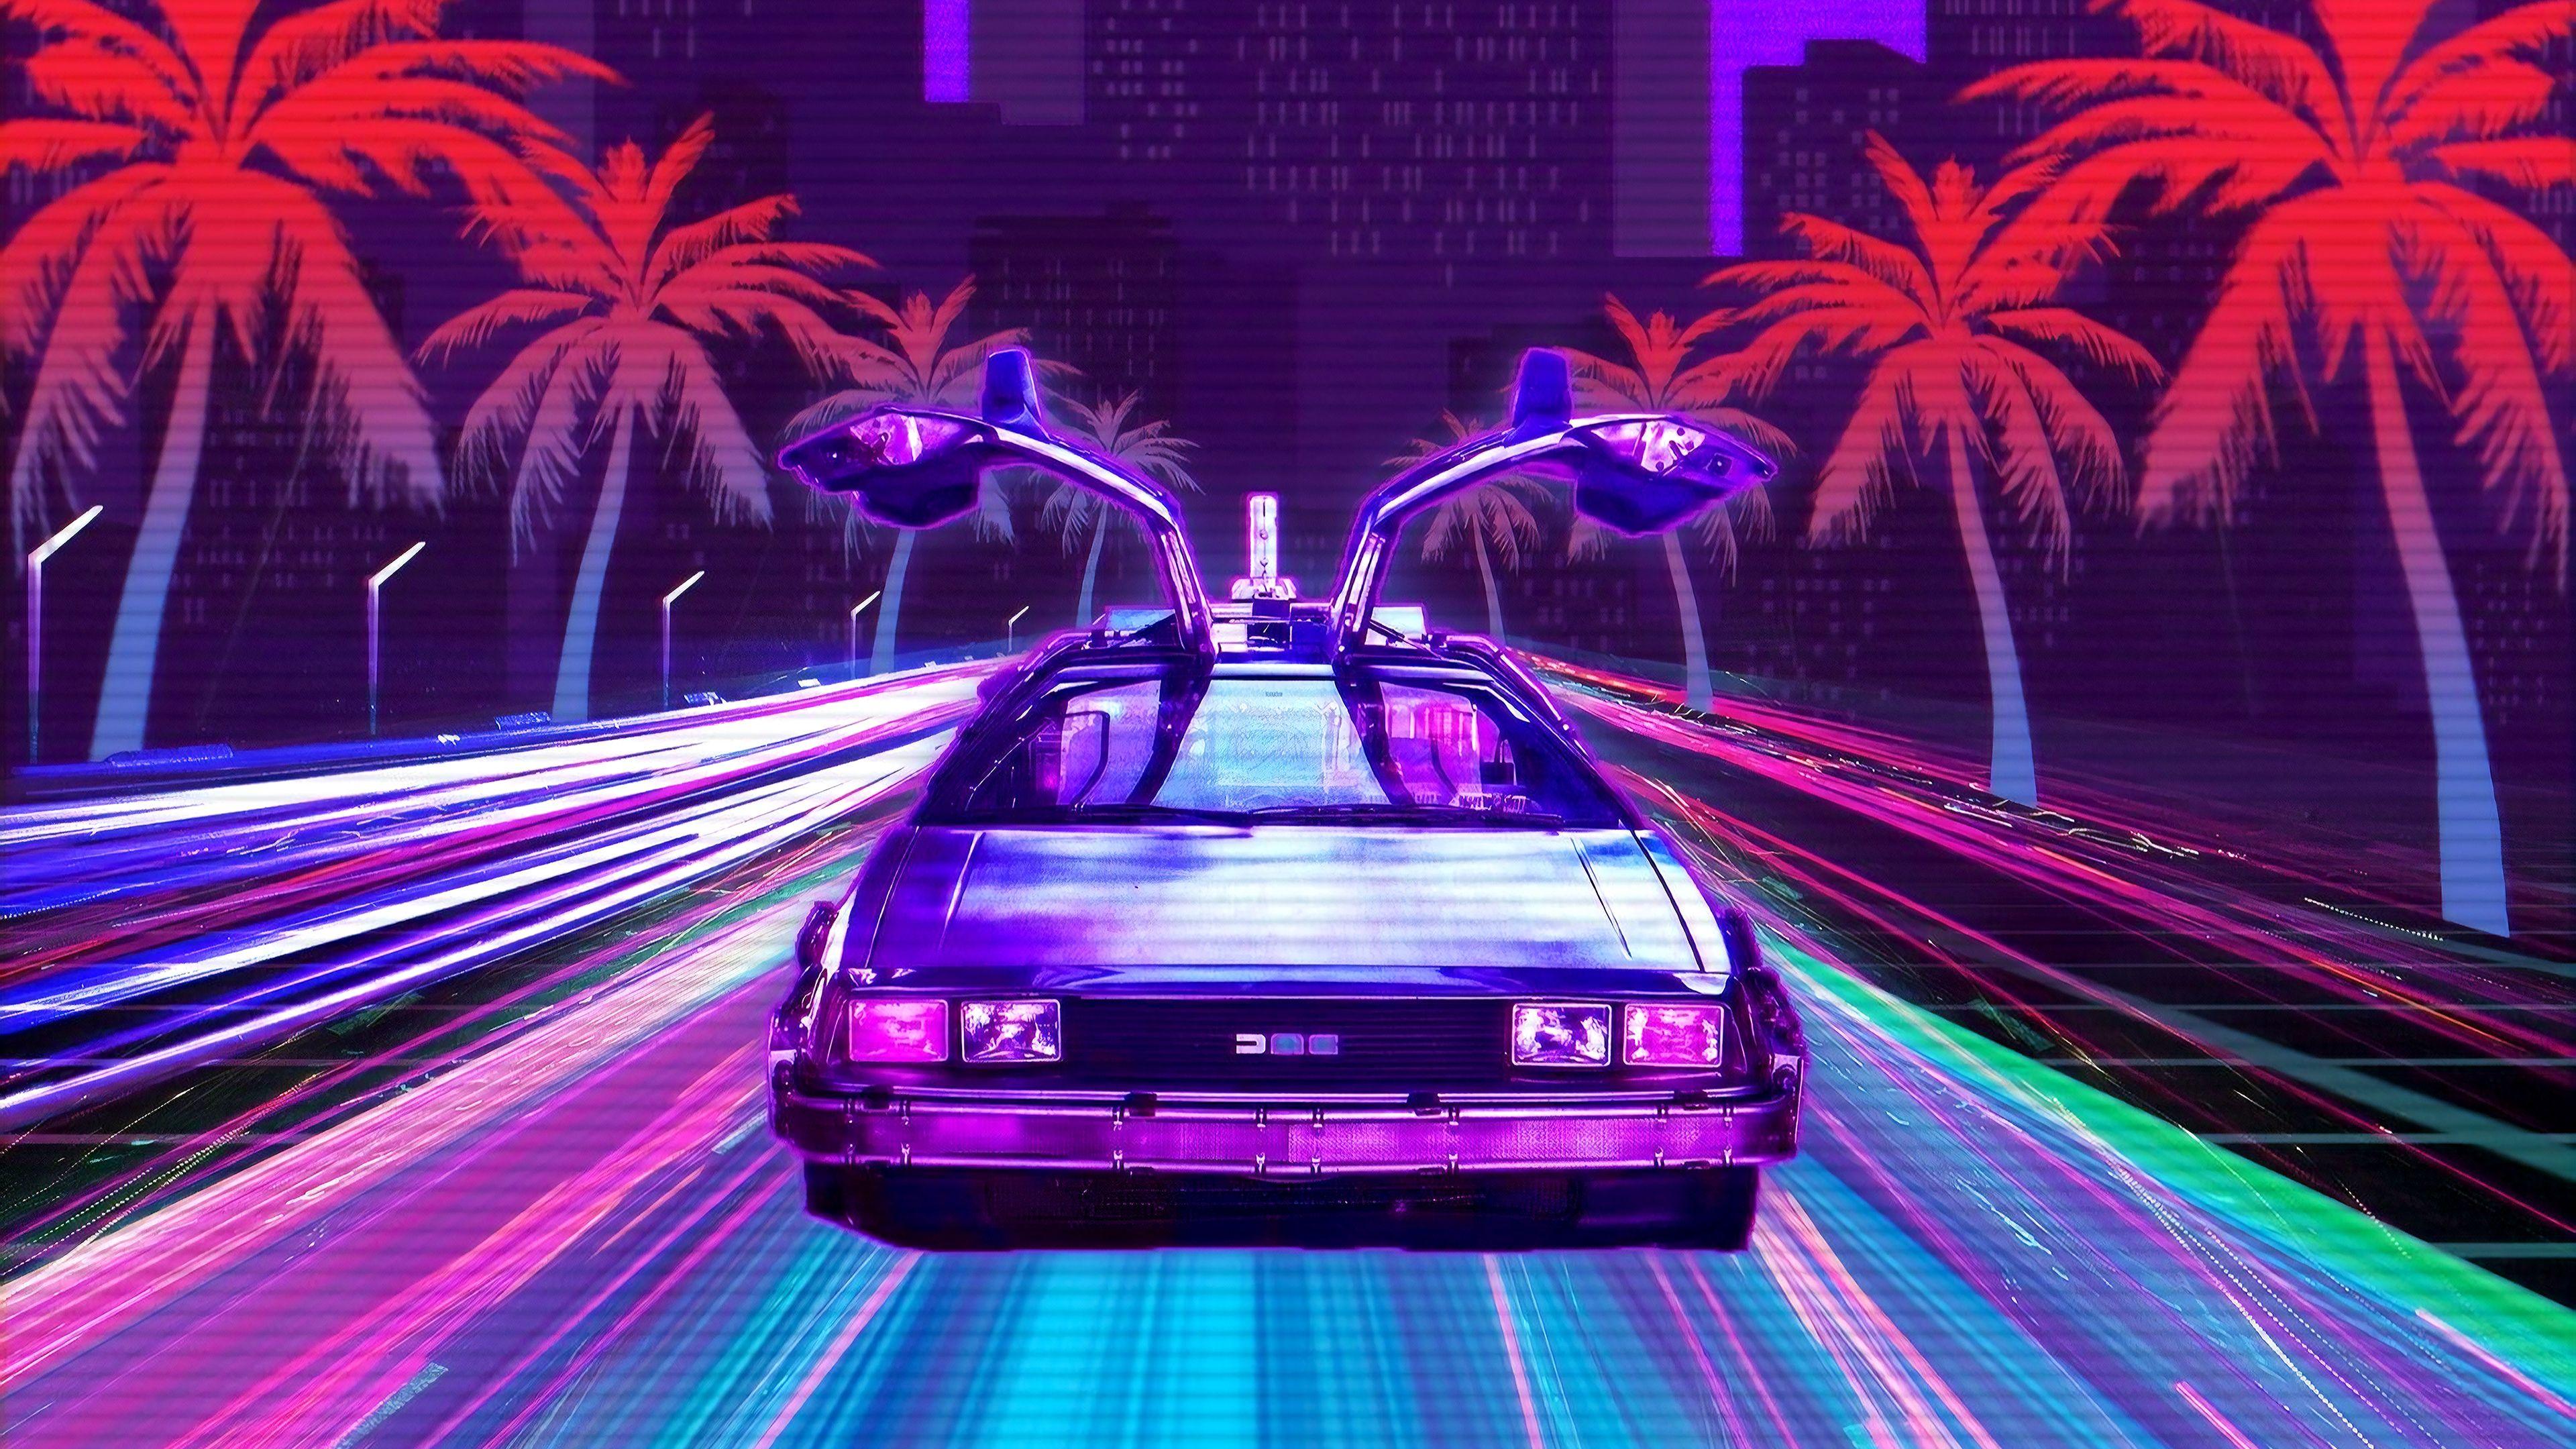 Retro Lux Cars Retrowave 4k Retrowave Wallpapers Hd Wallpapers Digital Art Wallpapers Cars Wallpapers Artwork Gaming Wallpapers Delorean Wallpaper Gallery